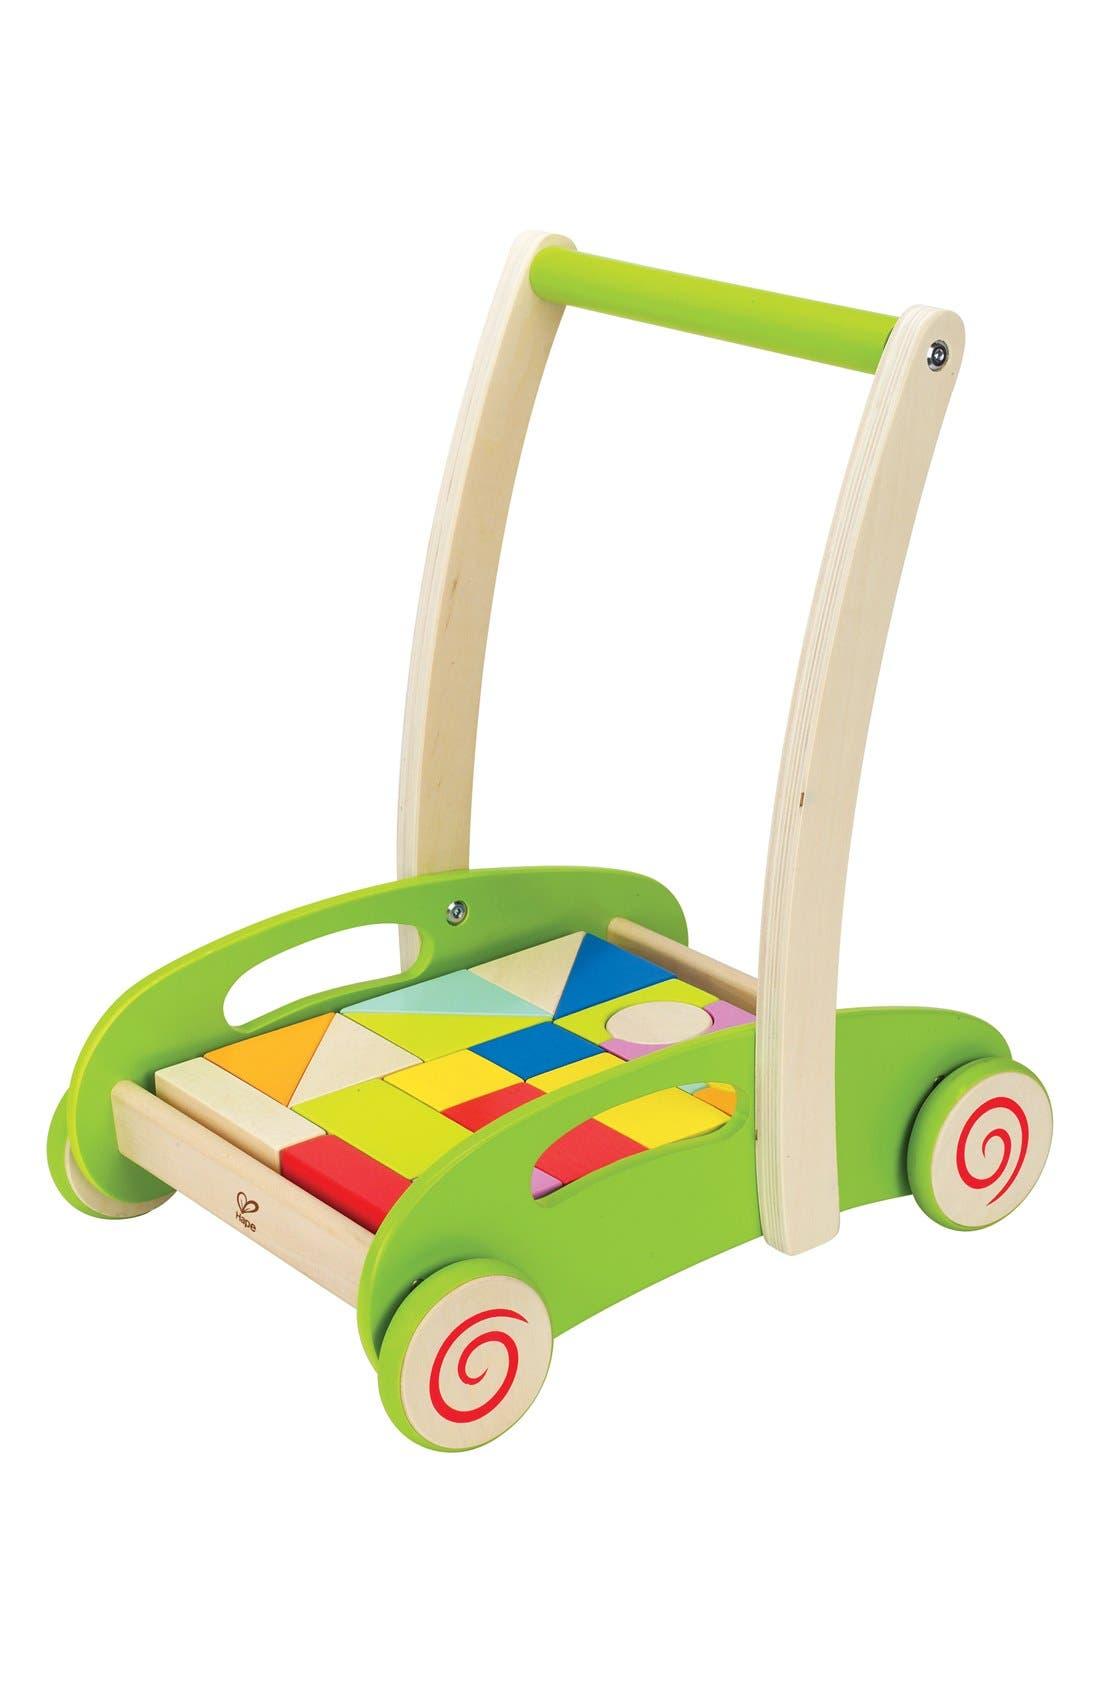 'Block & Roll' Push Toy,                             Alternate thumbnail 4, color,                             Green